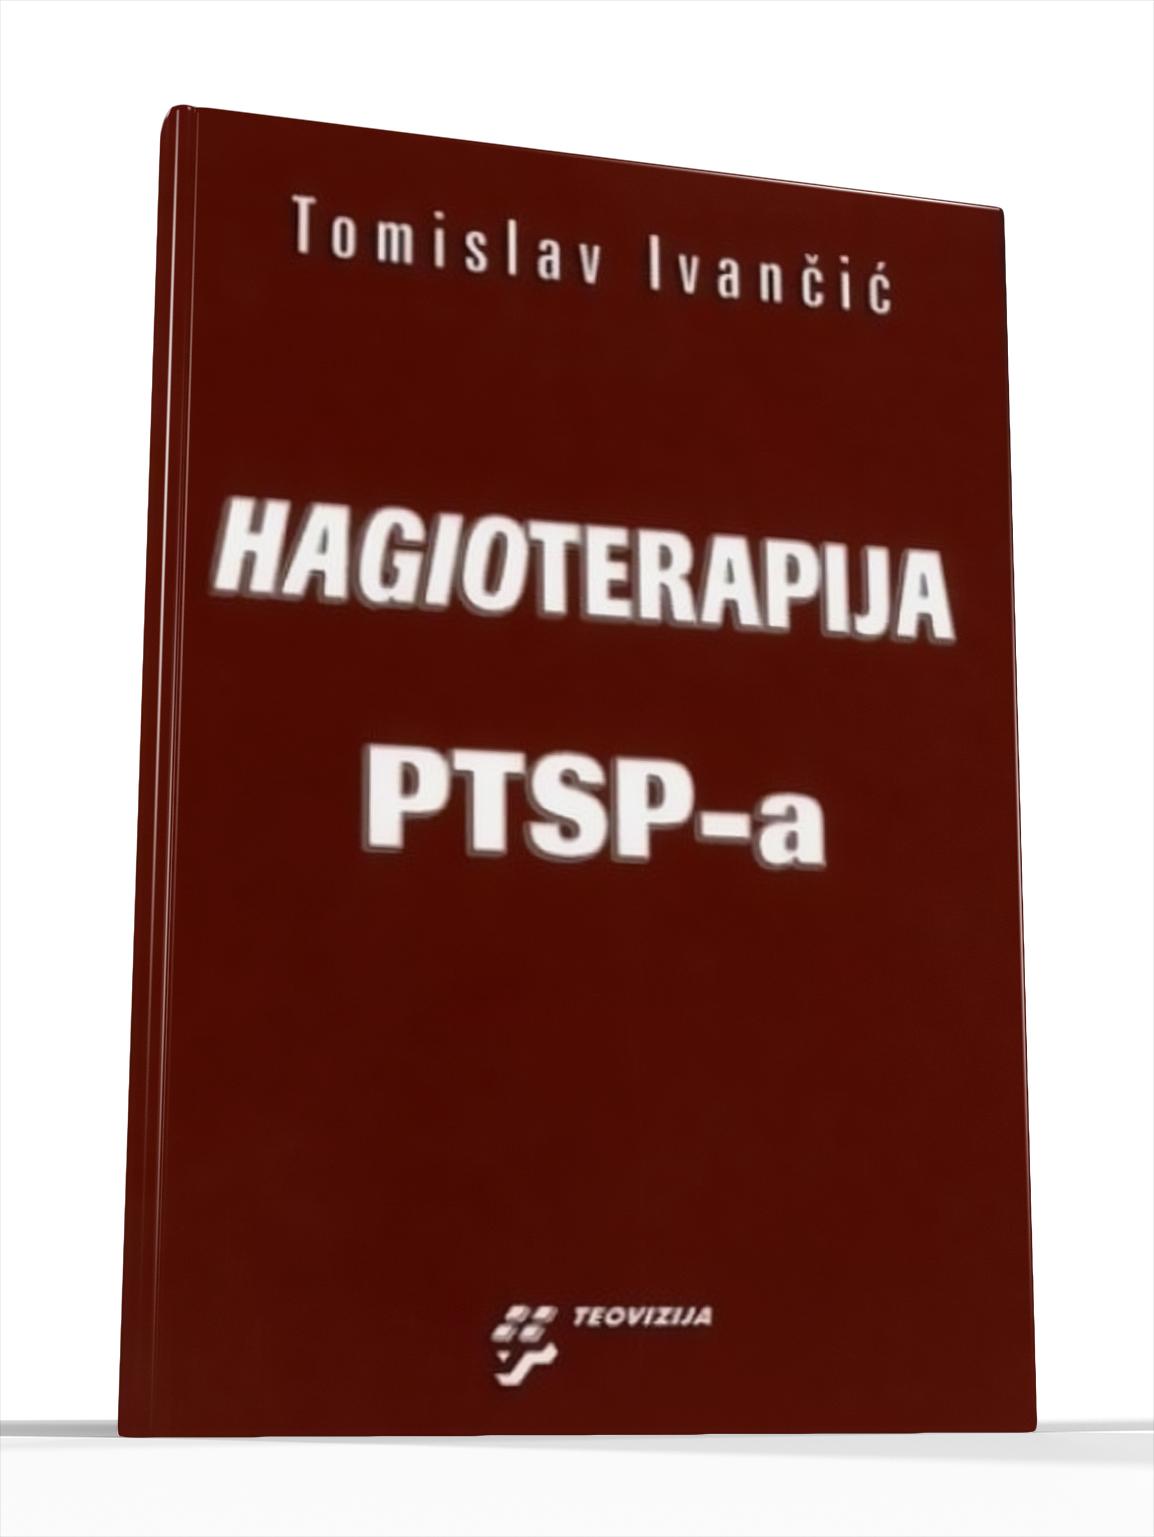 HAGIOTERAPIJA PTSP-a - Tomislav Ivančić